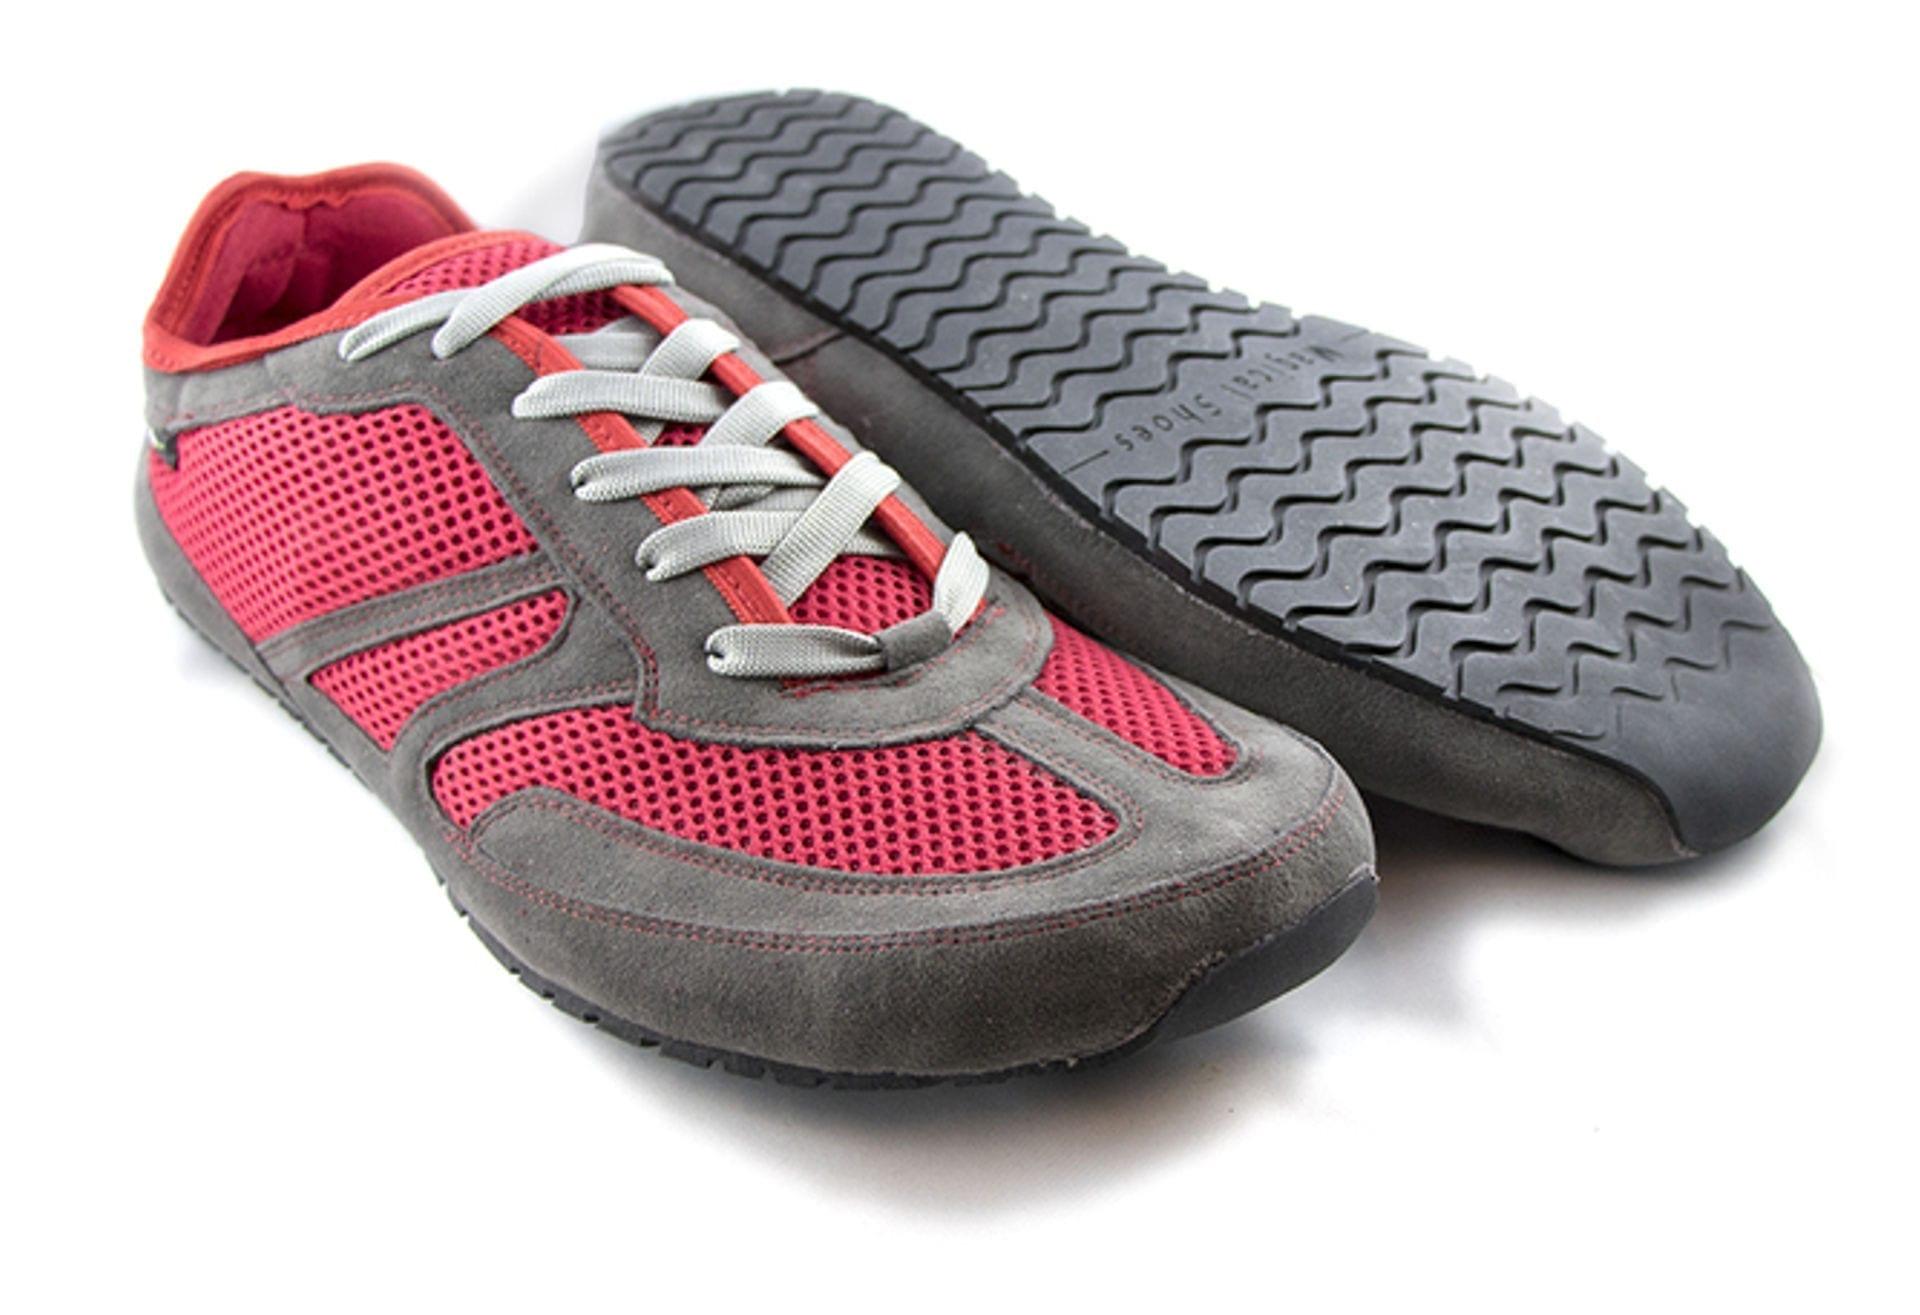 Buty do biegania boso minimalistyczne Magical Shoes Explorer Vegan Red